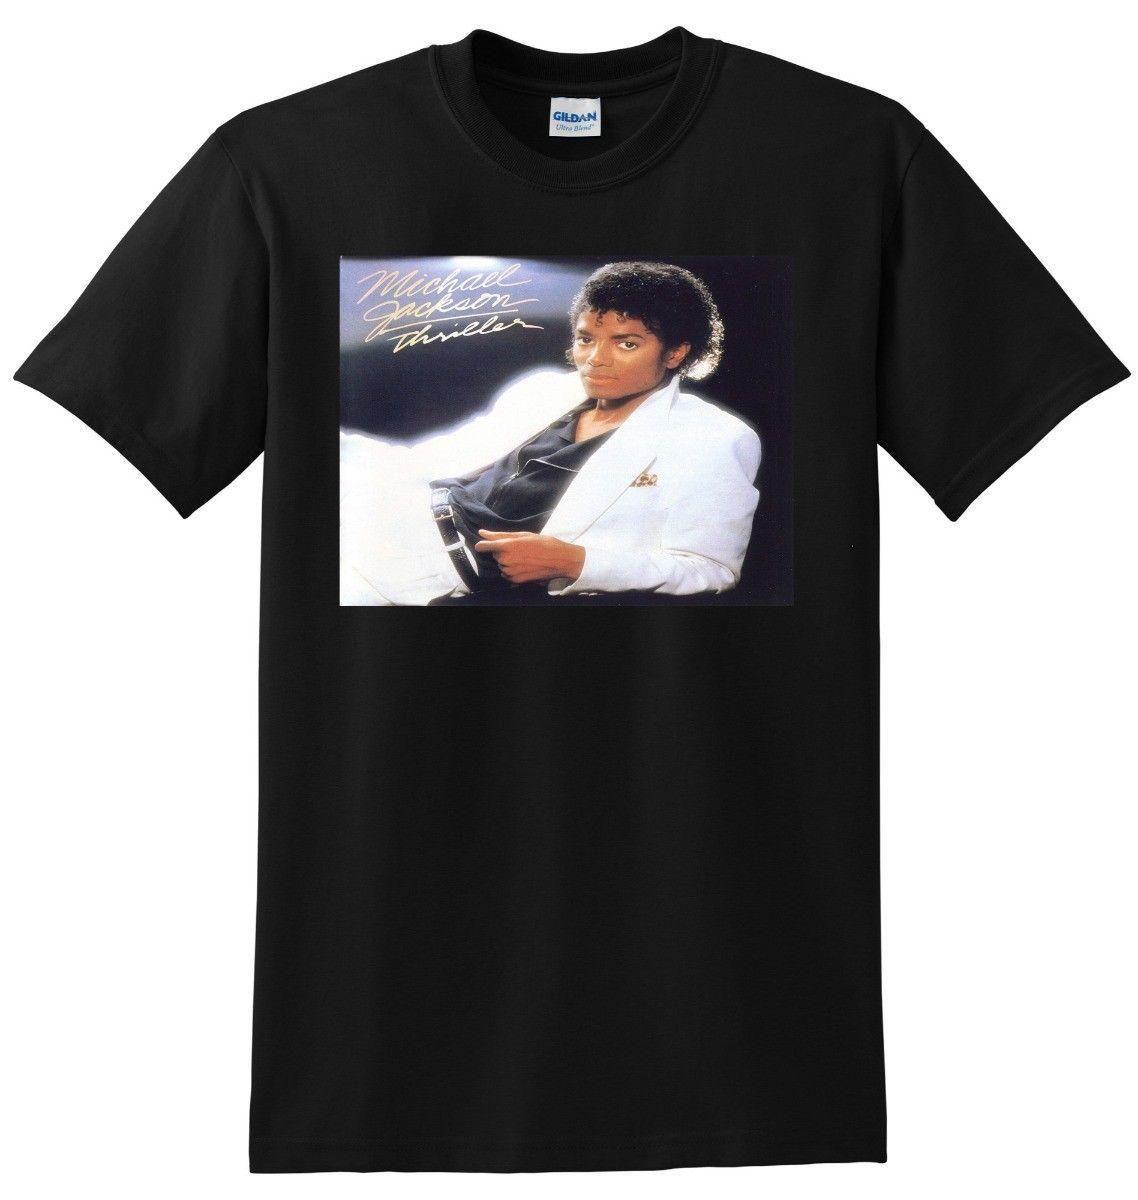 *NEW* MICHAEL JACKSON T SHIRT thriller vinyl cd cover SMALL MEDIUM LARGE or  XL Mens T Shirt Summer O Neck 100% Cotton